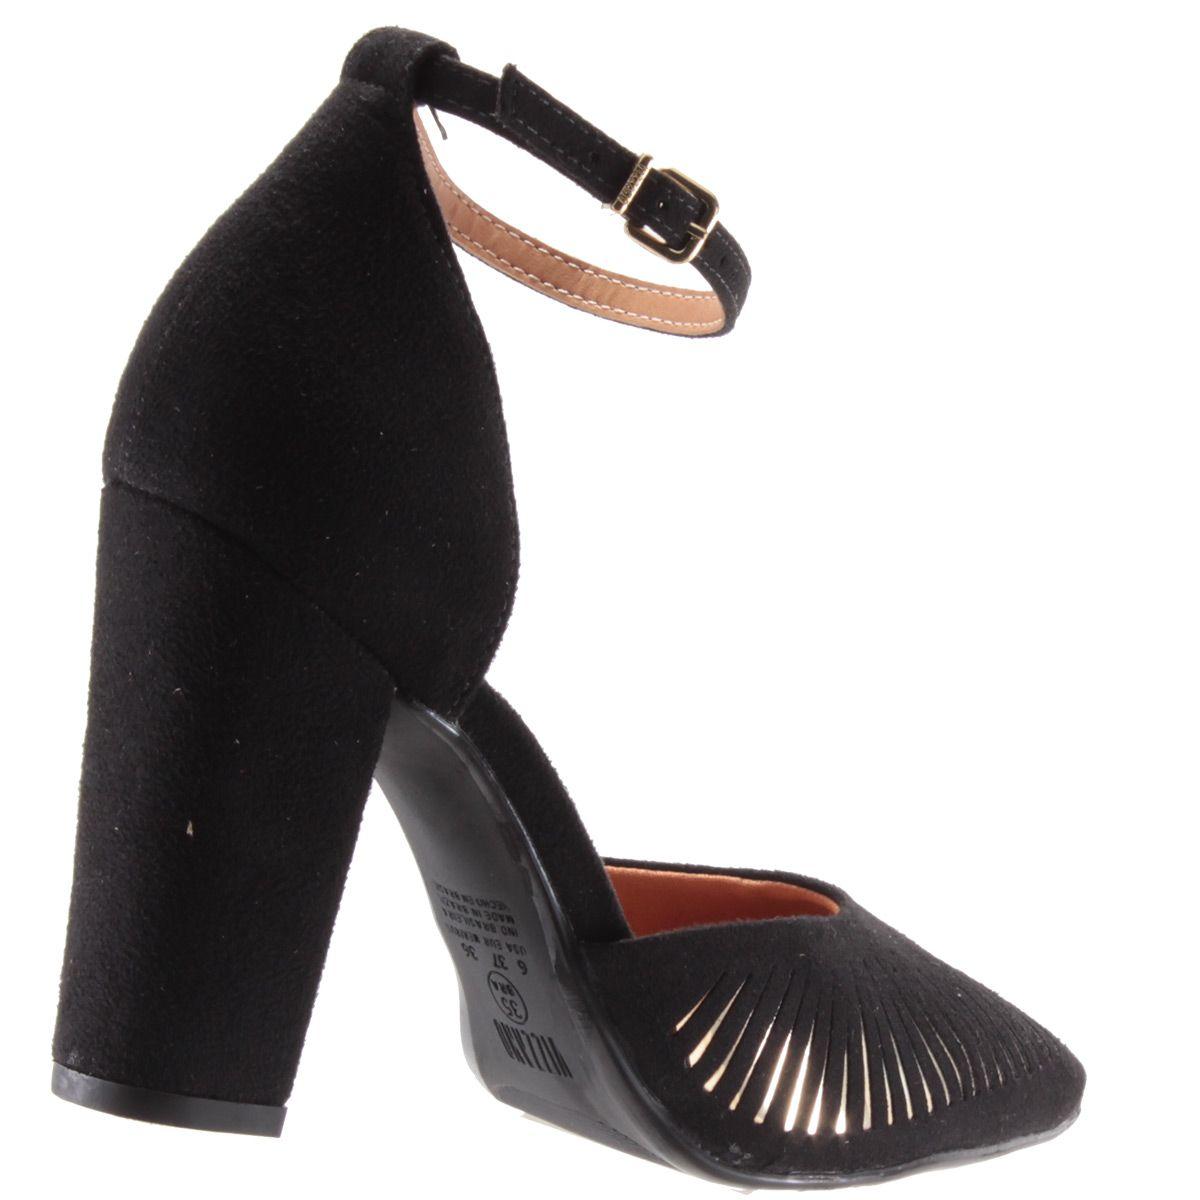 Scarpin Vizzano Sapato Feminino Salto Alto Metalizado 1264105